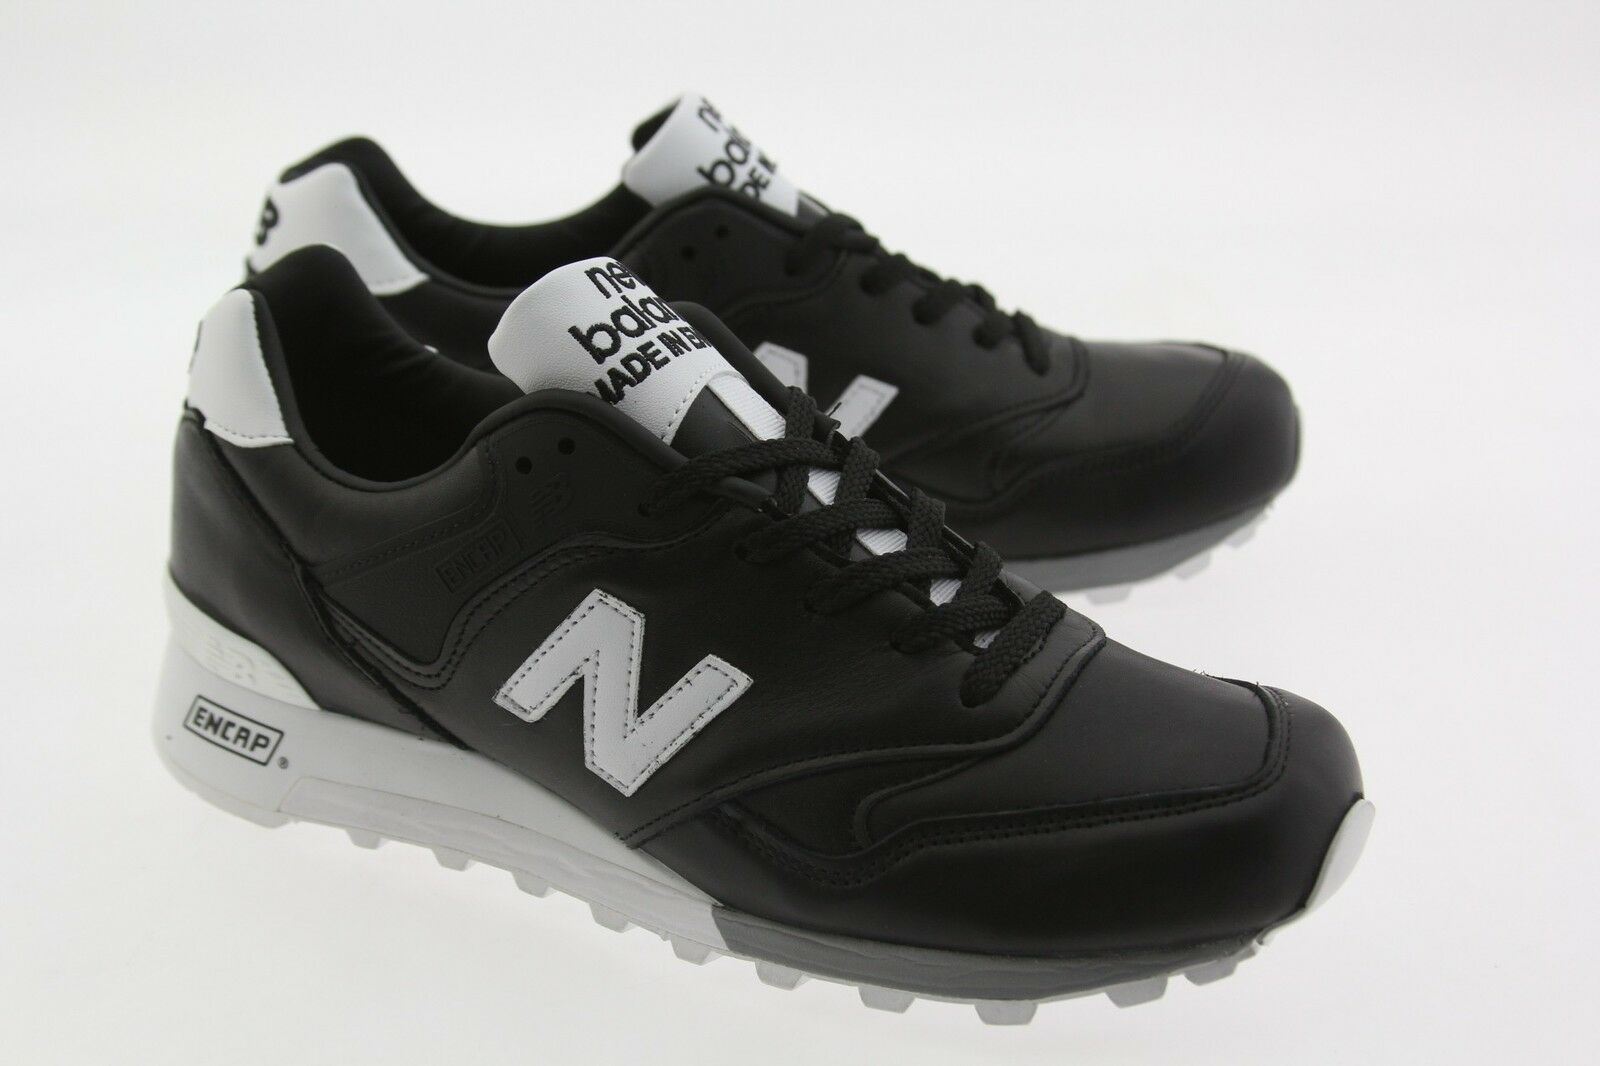 New Balance Men 577 Made in UK Football M577FB black white M577FB